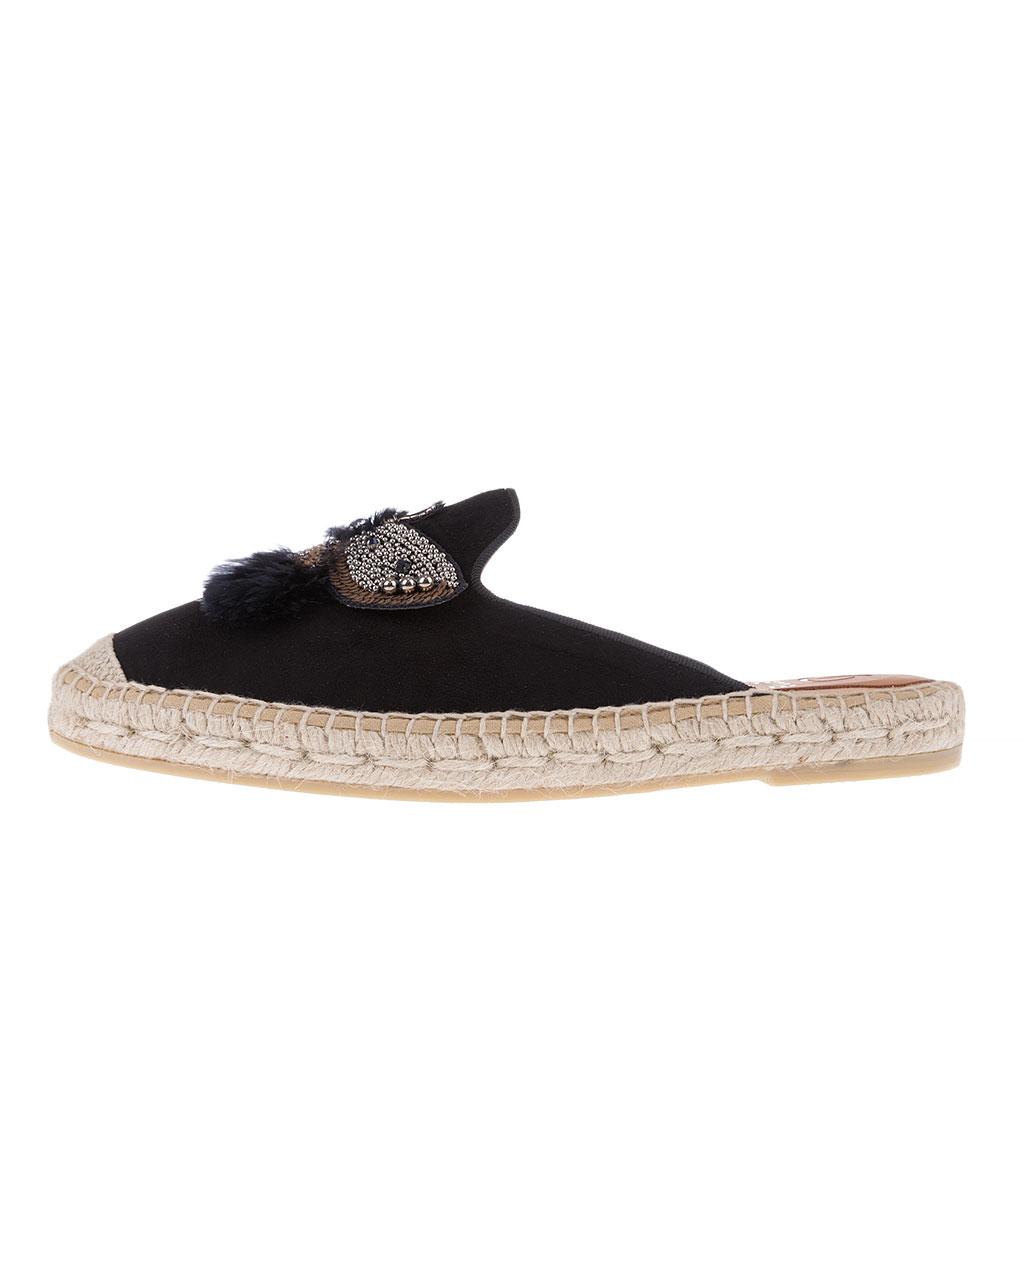 Women's shoes KANNA (original) 19KV9561-черн /91 — buy